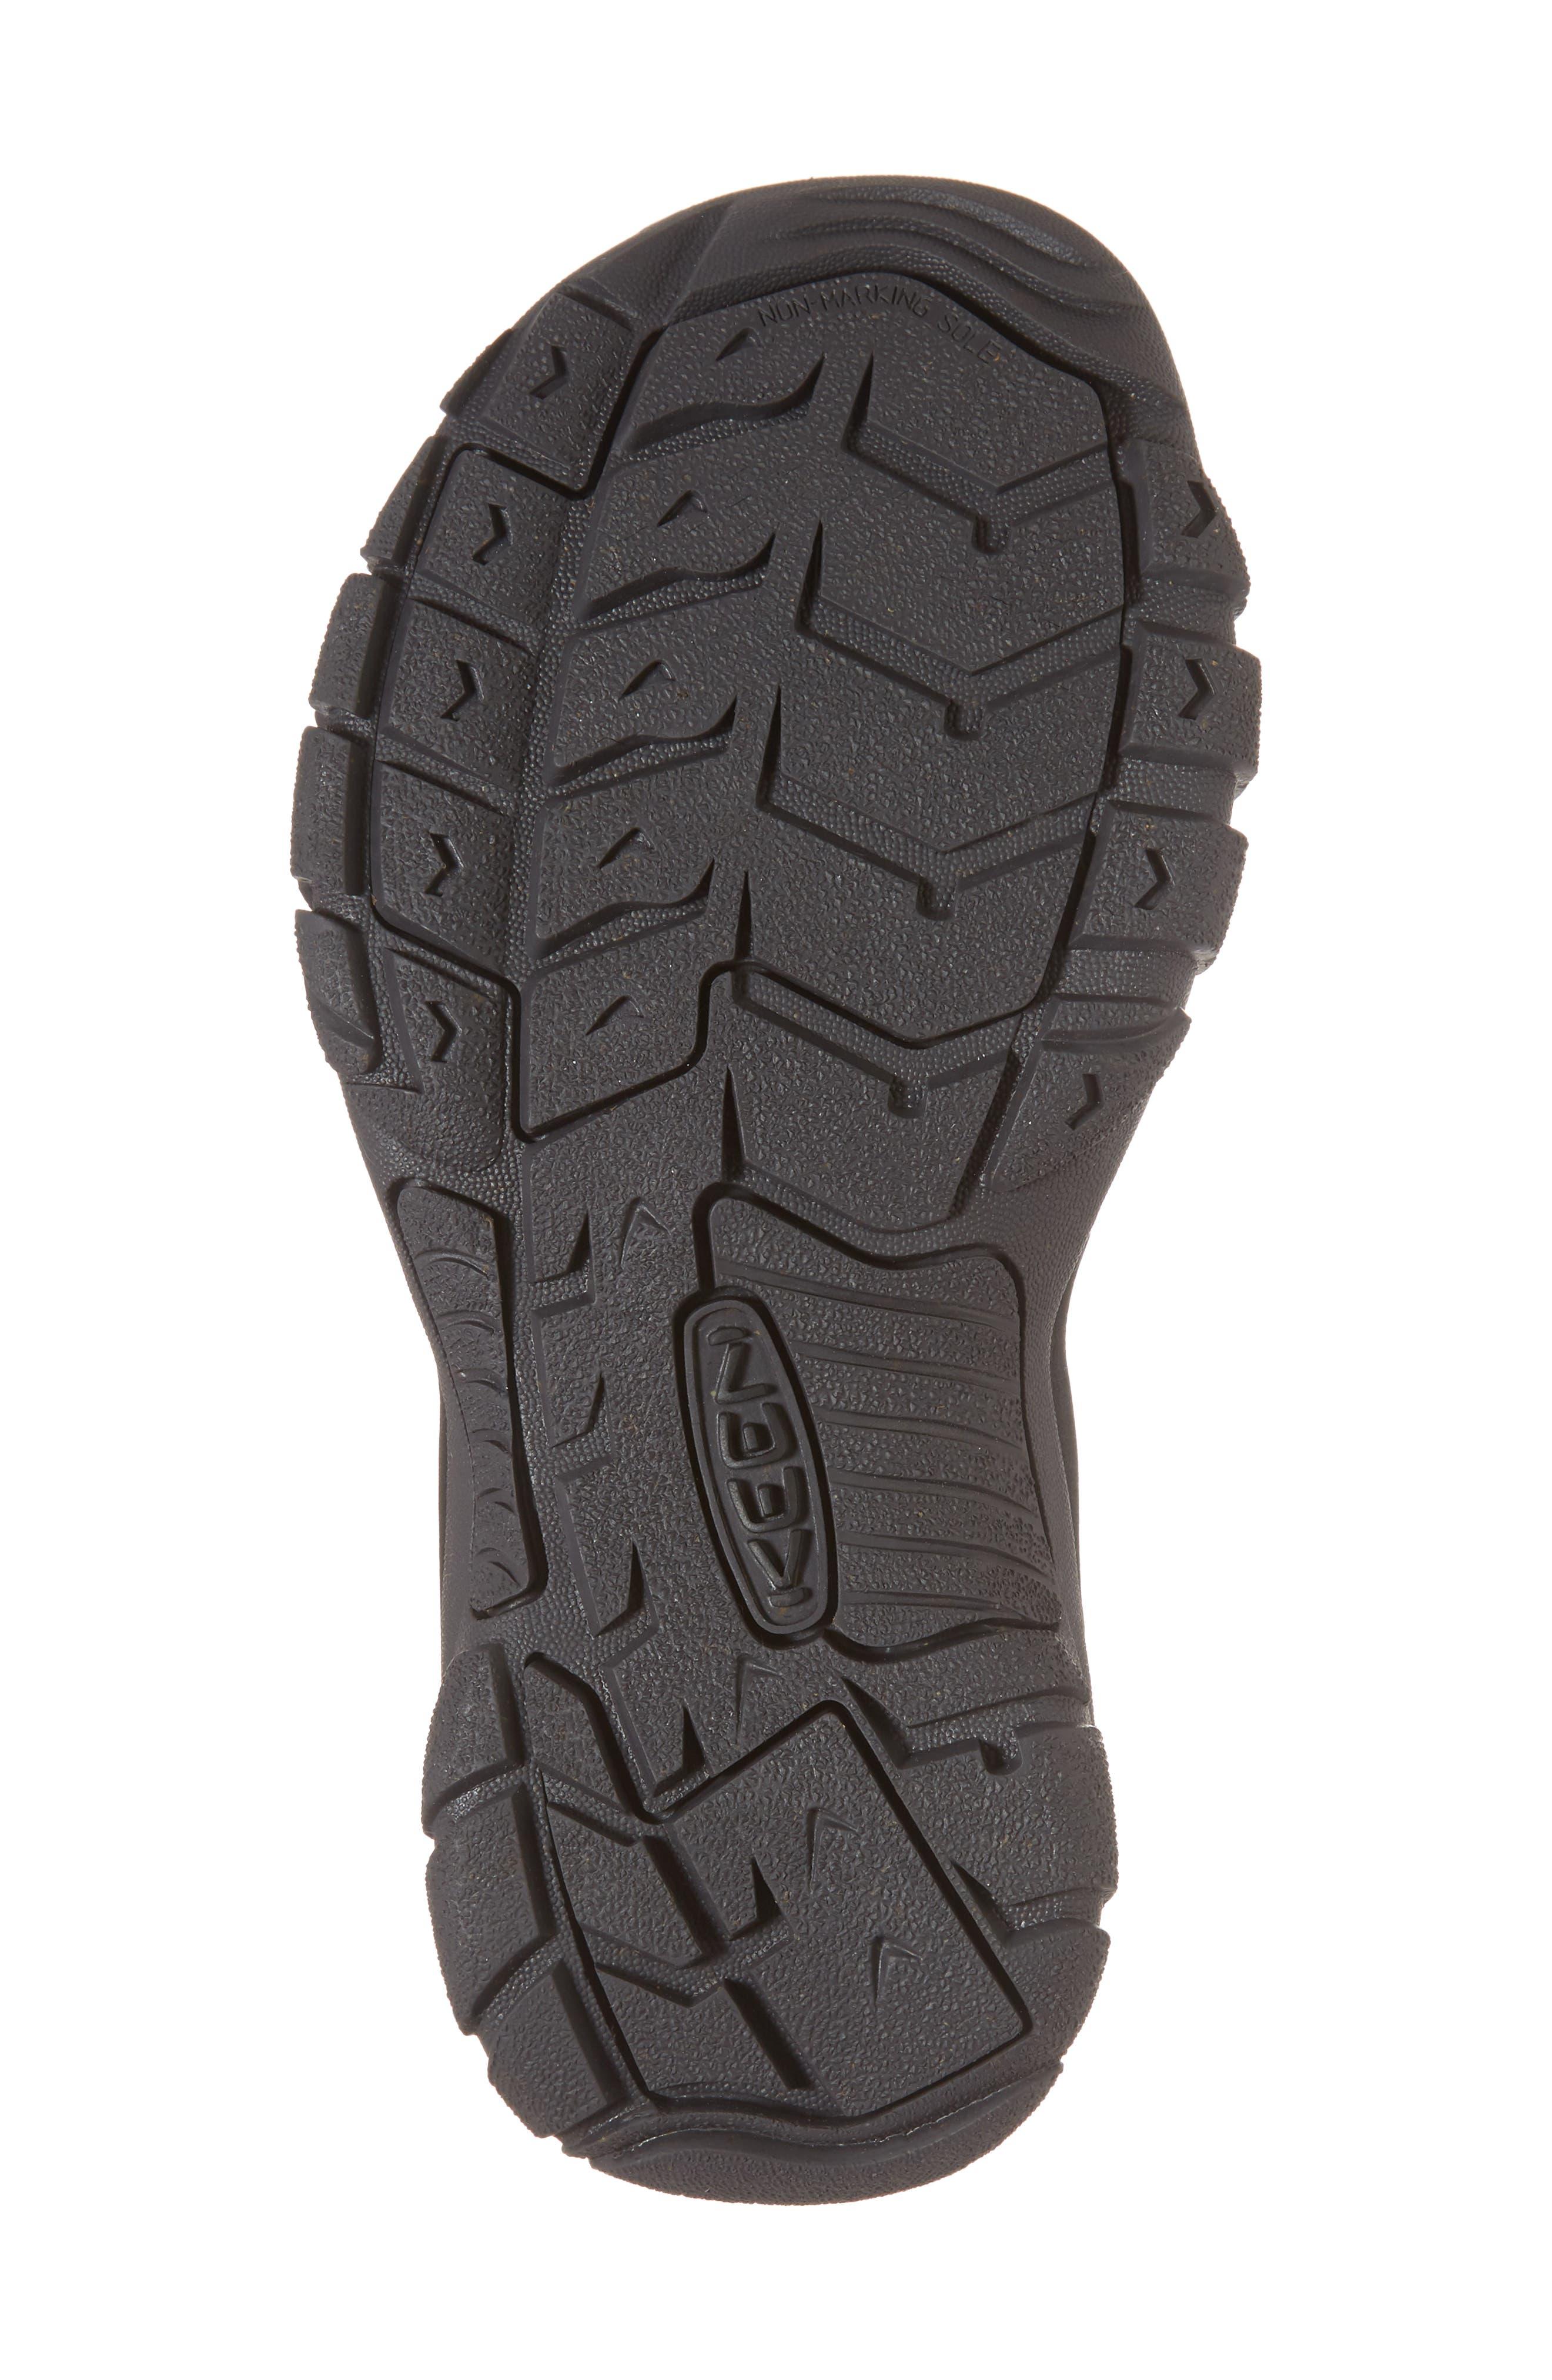 Newport Eco Waterproof Sandal,                             Alternate thumbnail 6, color,                             Black/ Magnet